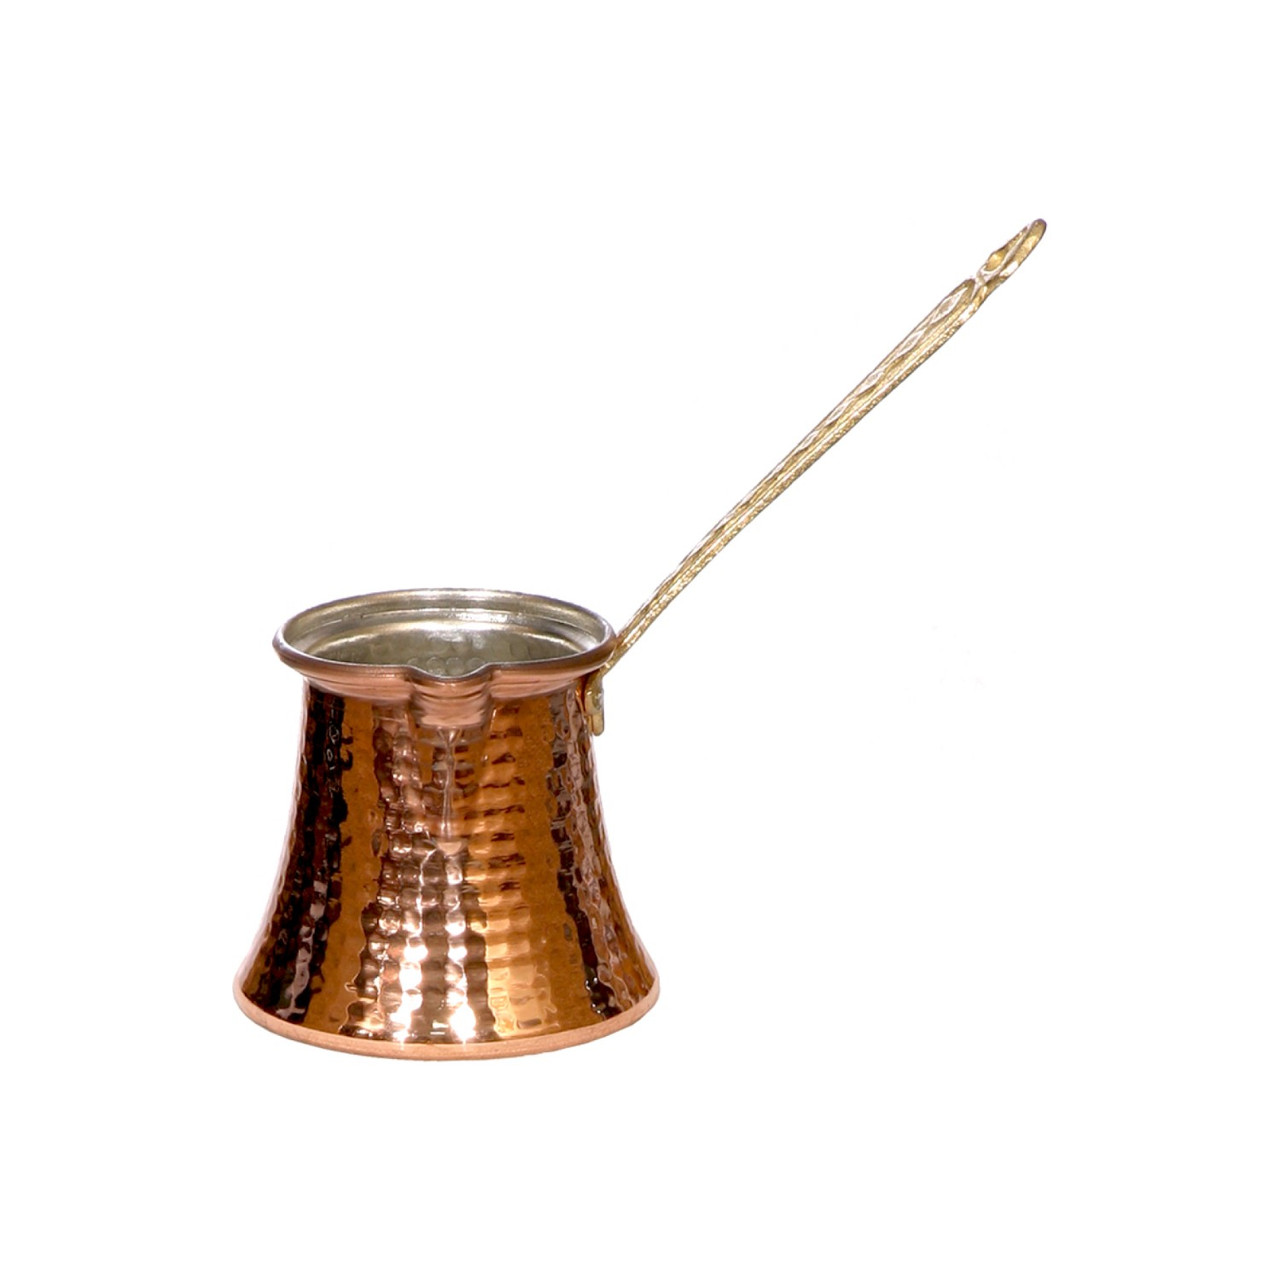 BAKIR Cezve #5 (Copper Coffe Pot)